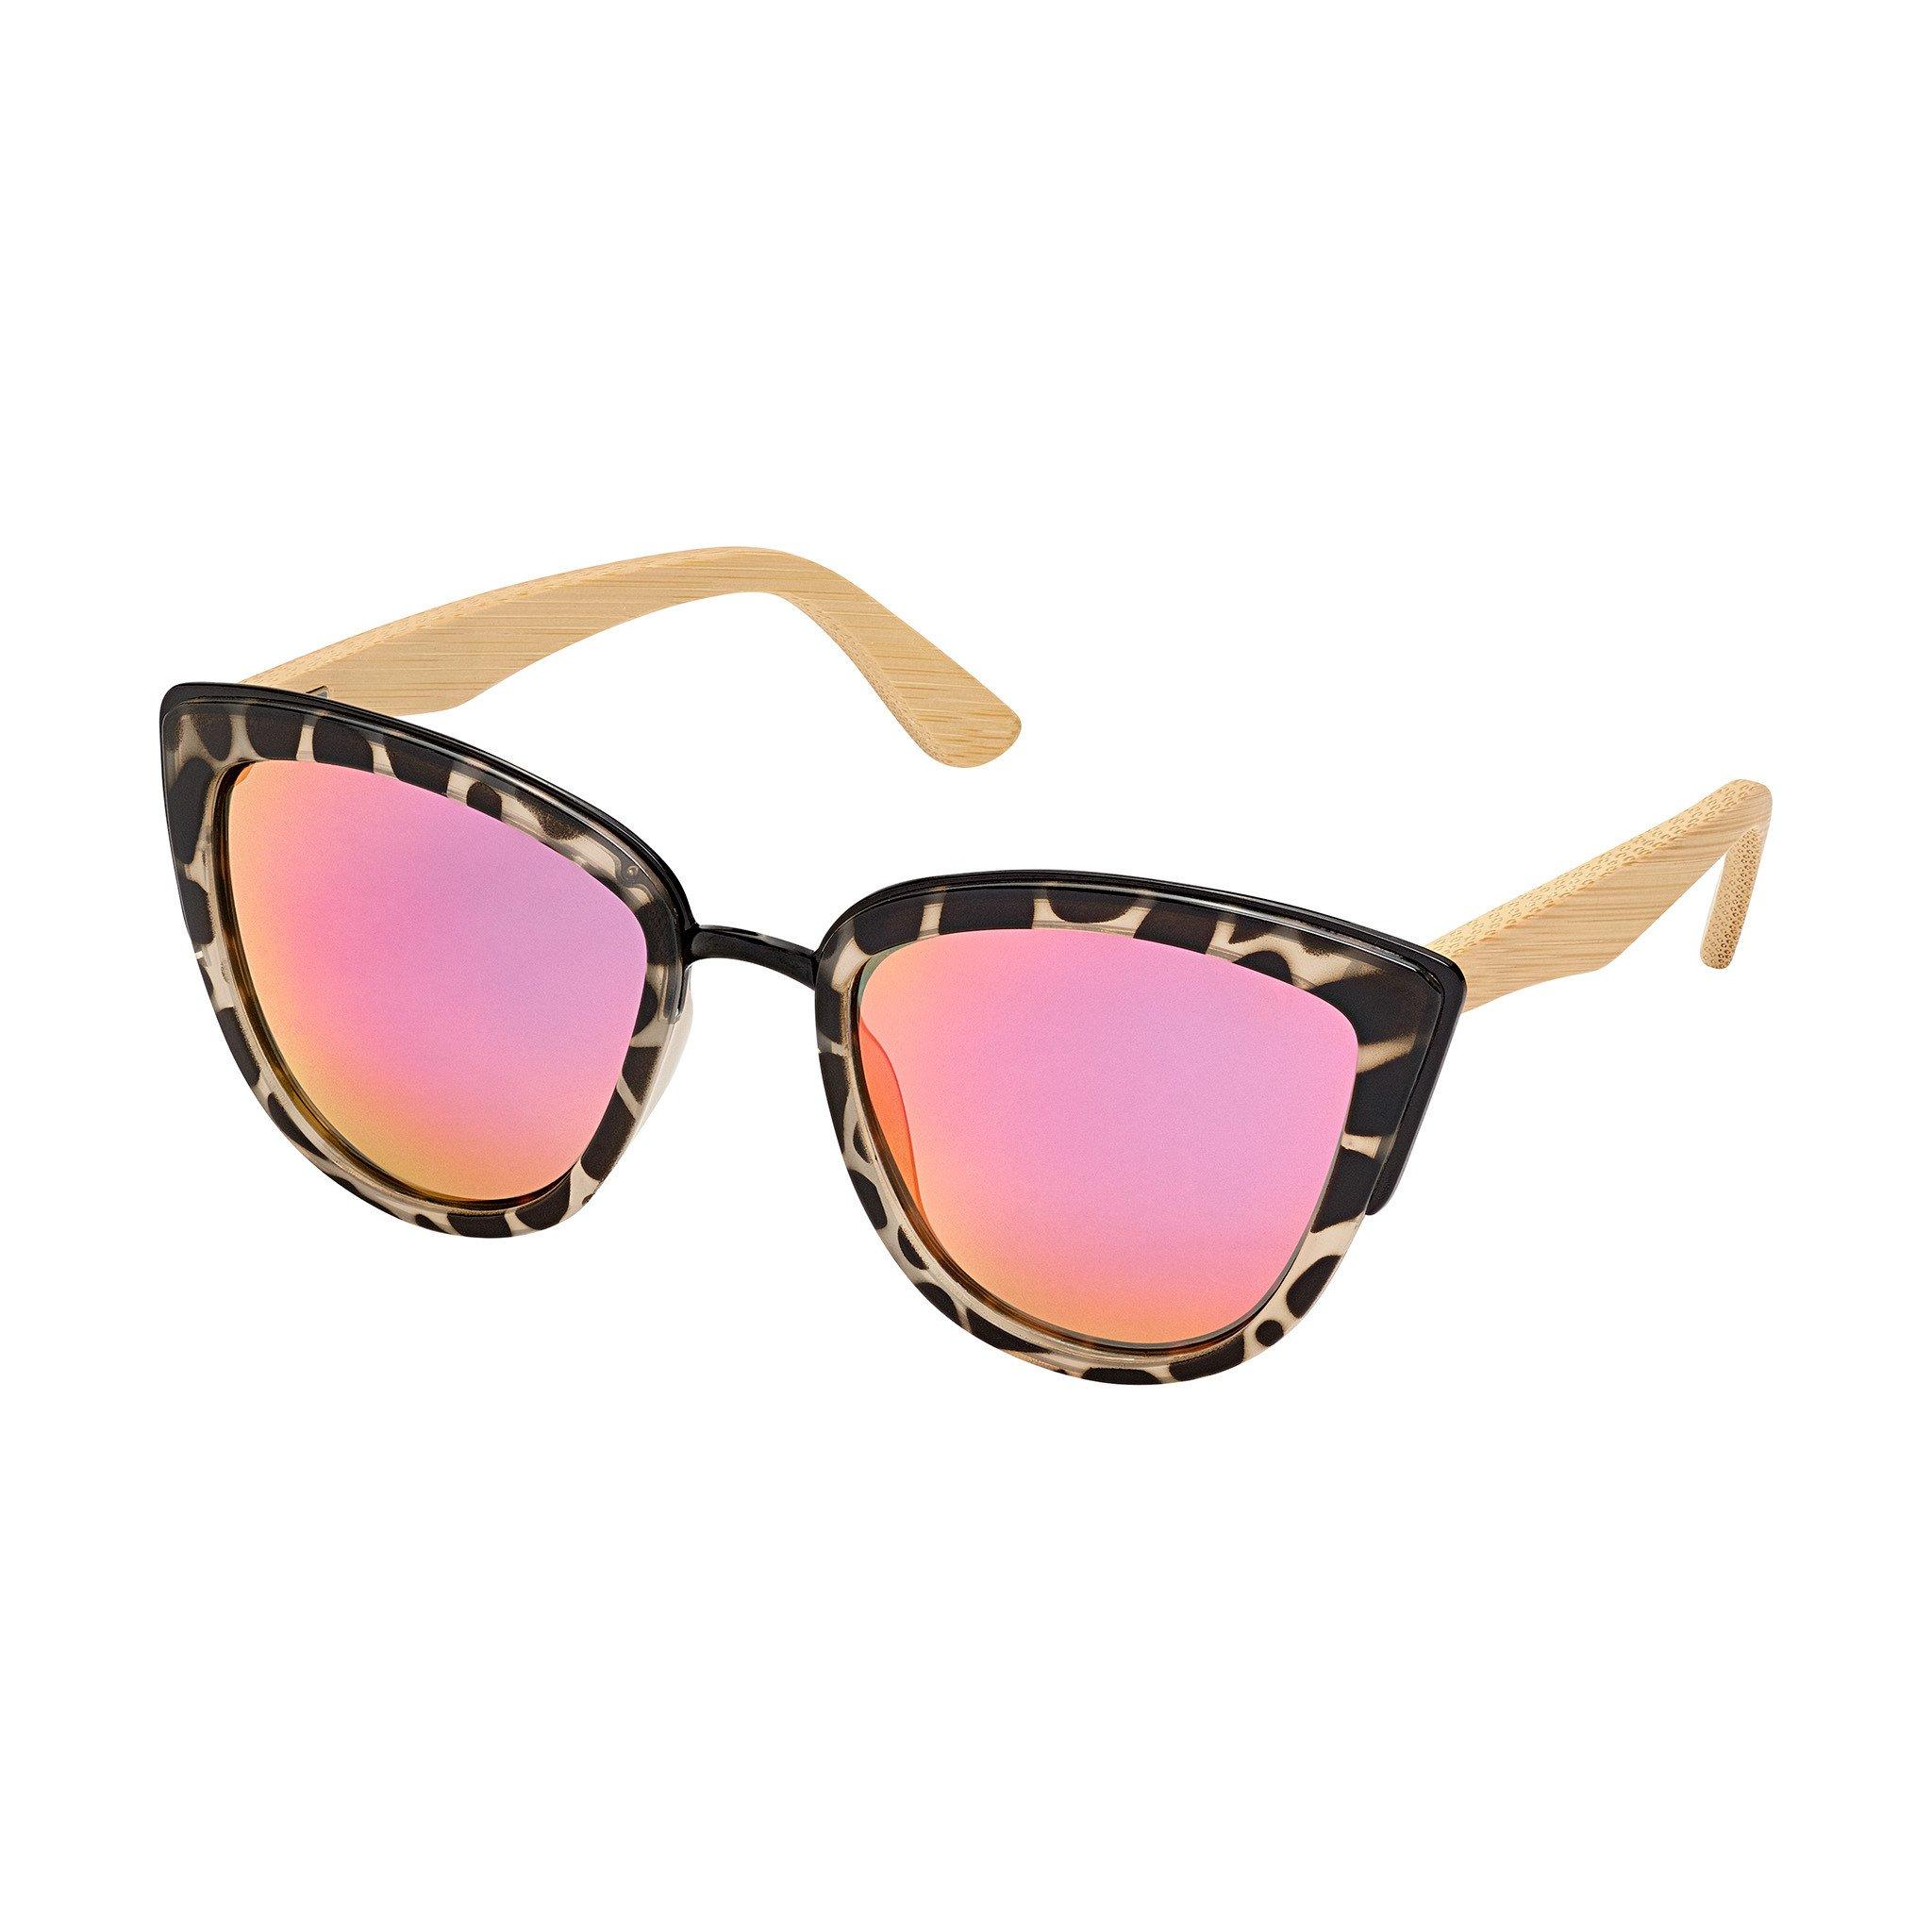 ethical sunglasses